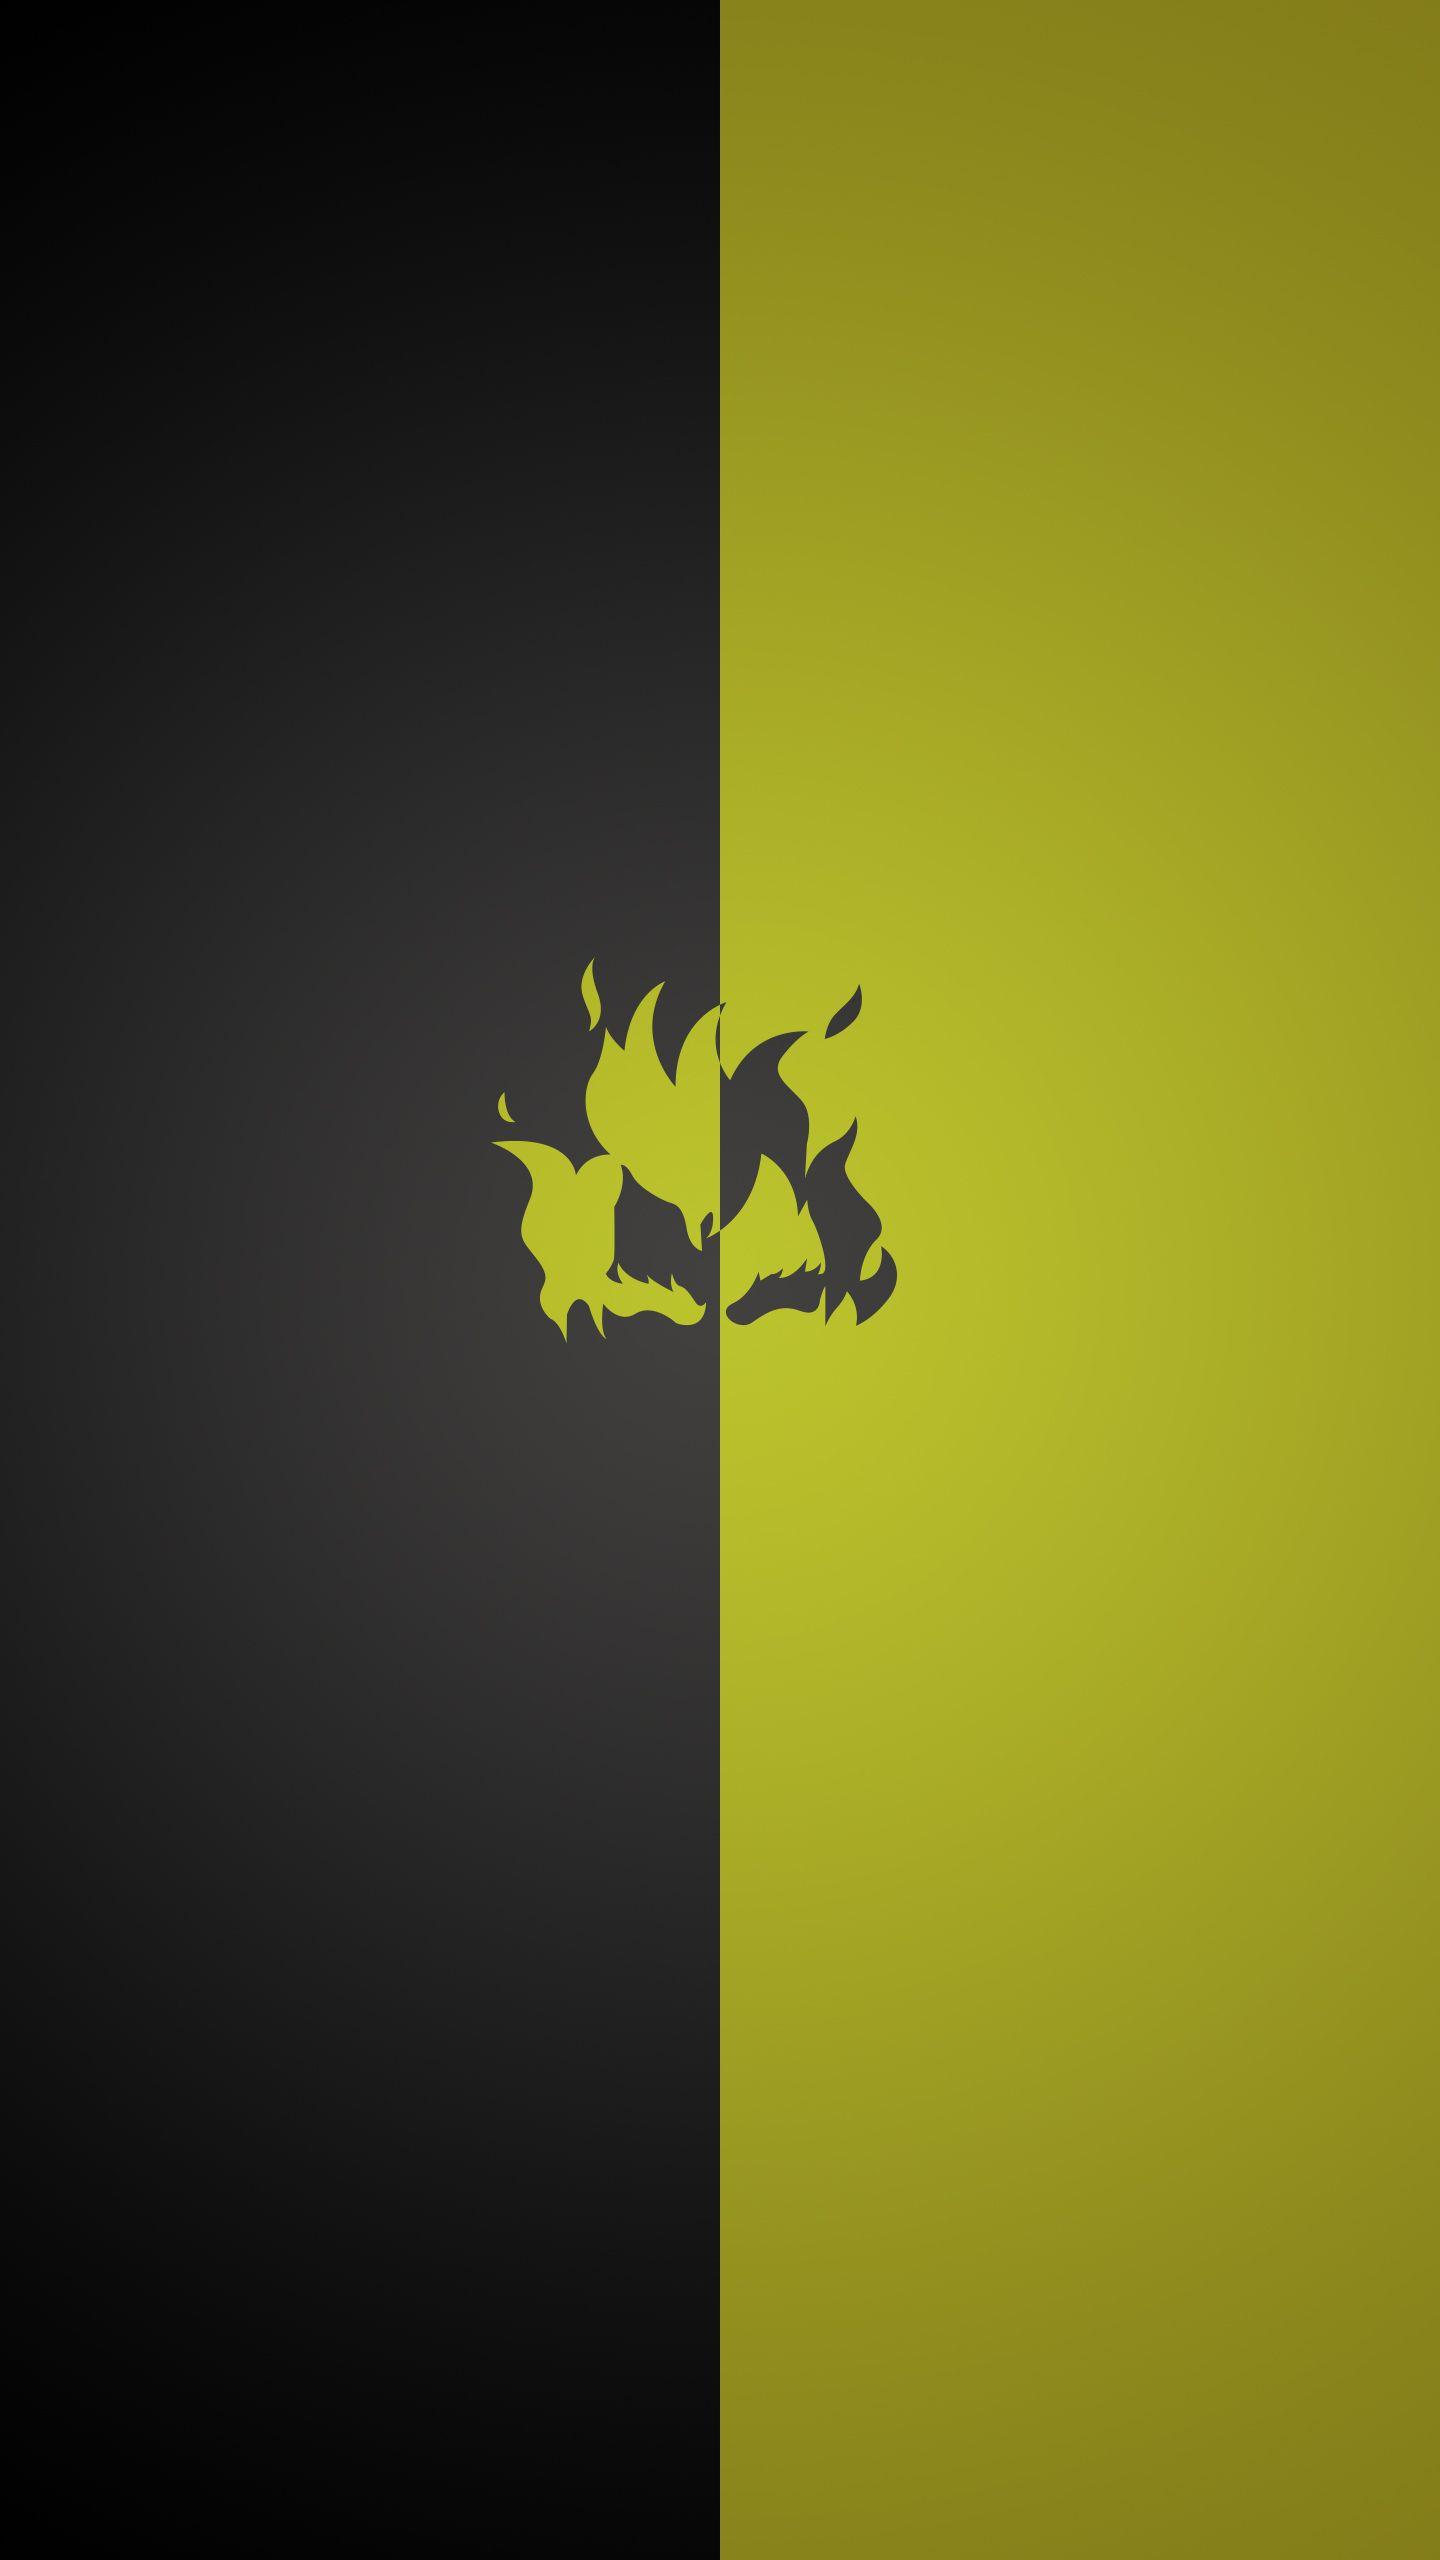 Overwatch - Junkrat Wallpaper for V20 | Works | Pinterest ...